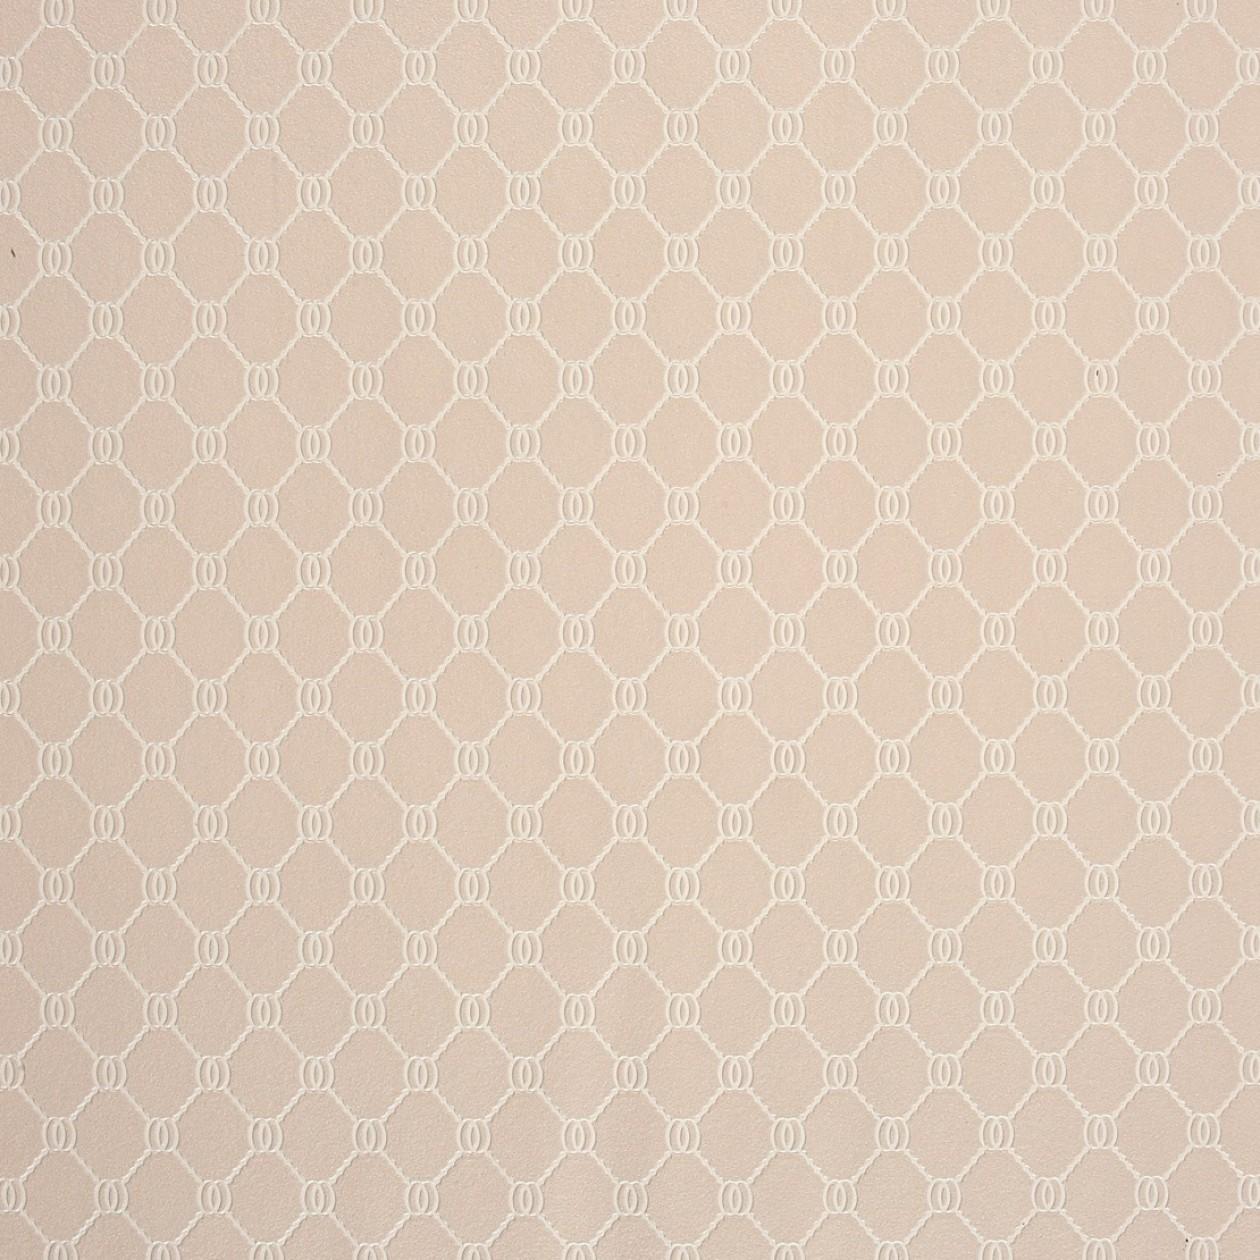 Французские обои Caselio,  коллекция Elegante, артикулELG60511056